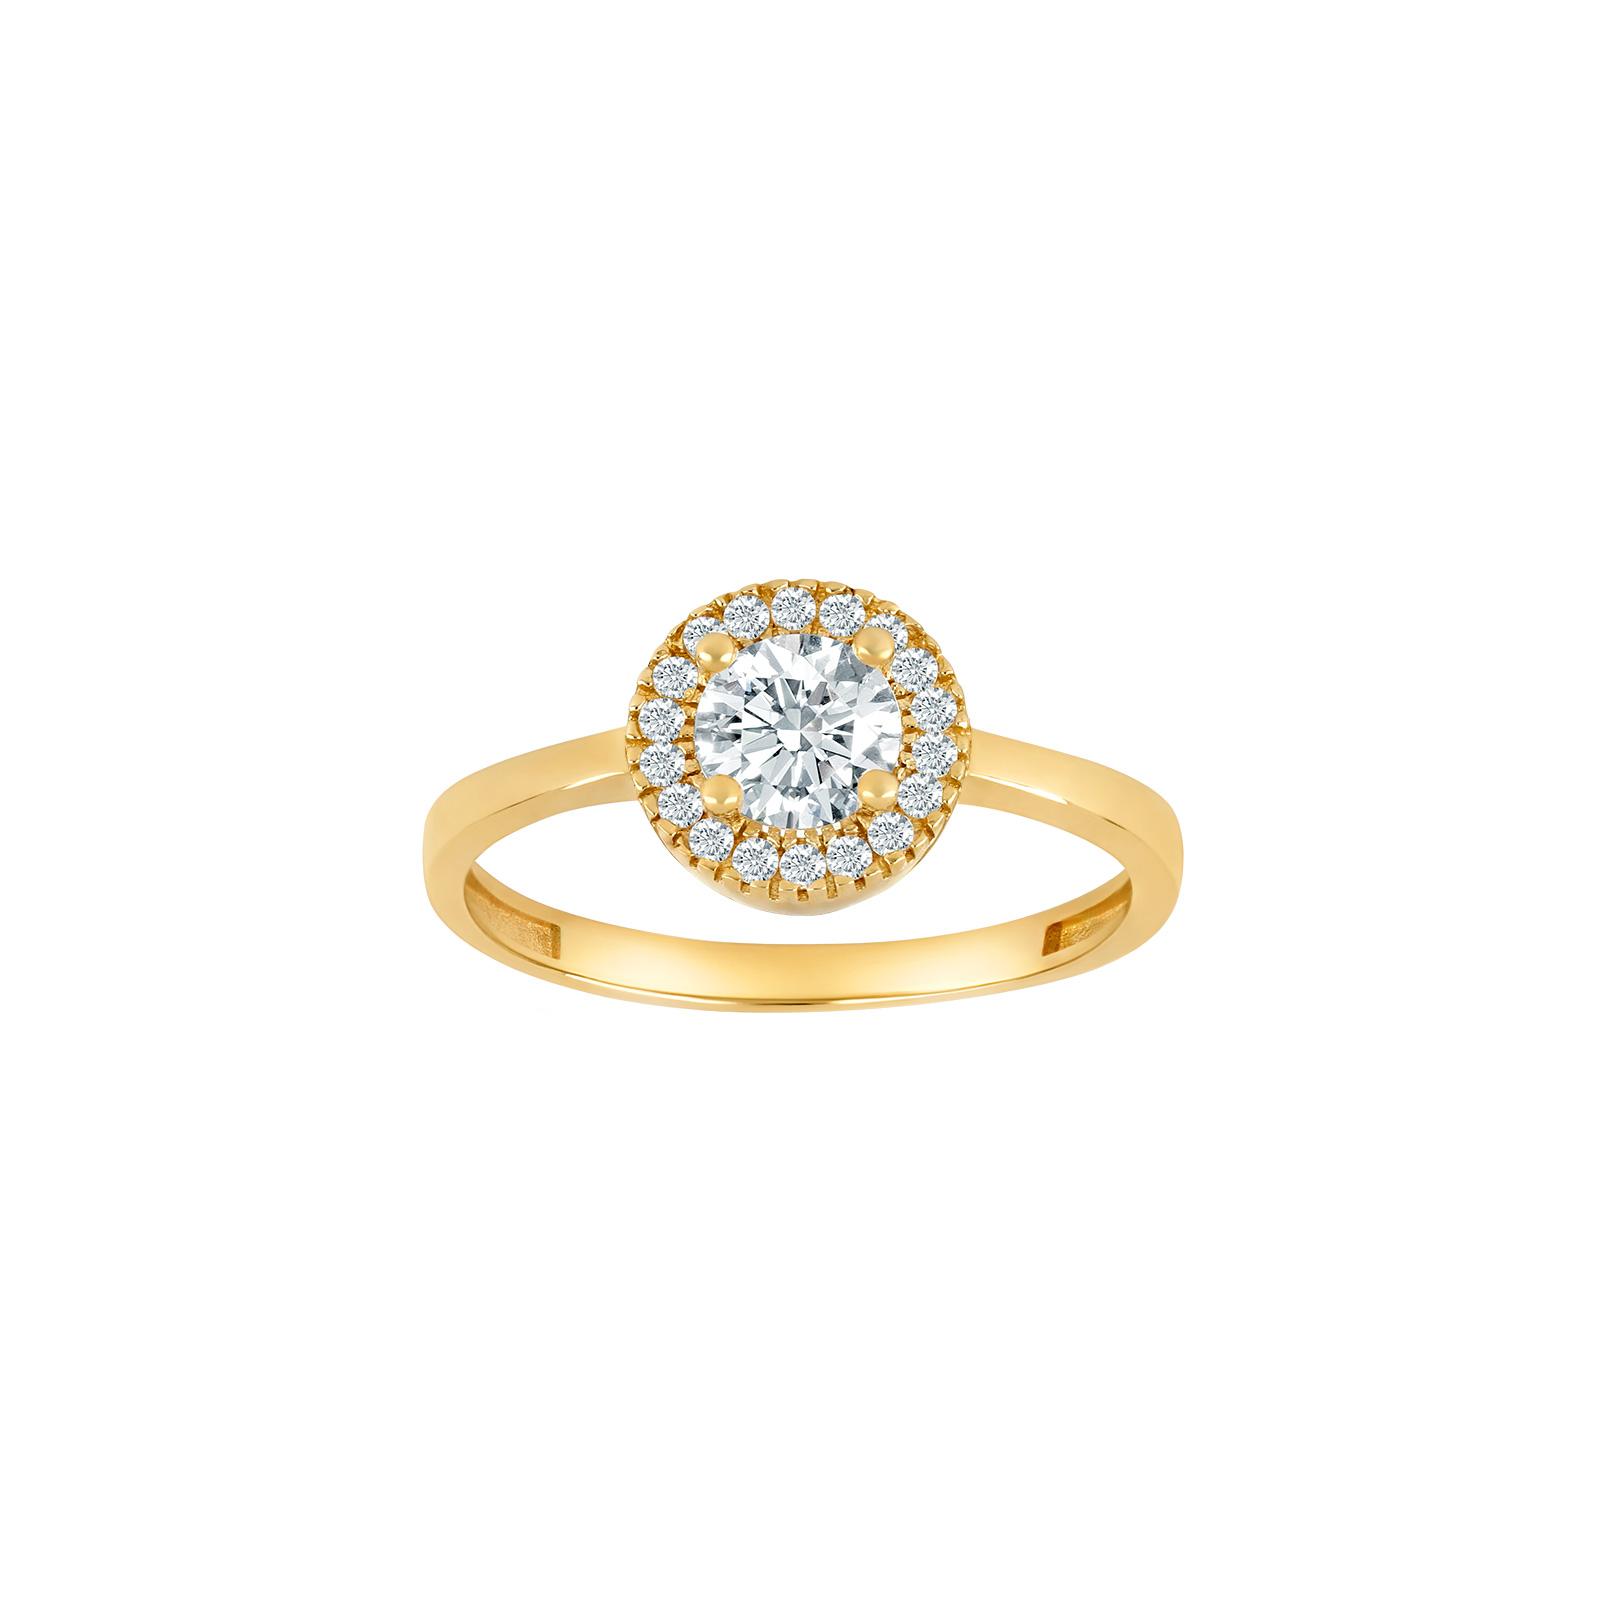 8 karat guld ring med zirkoner fra Siersbøl